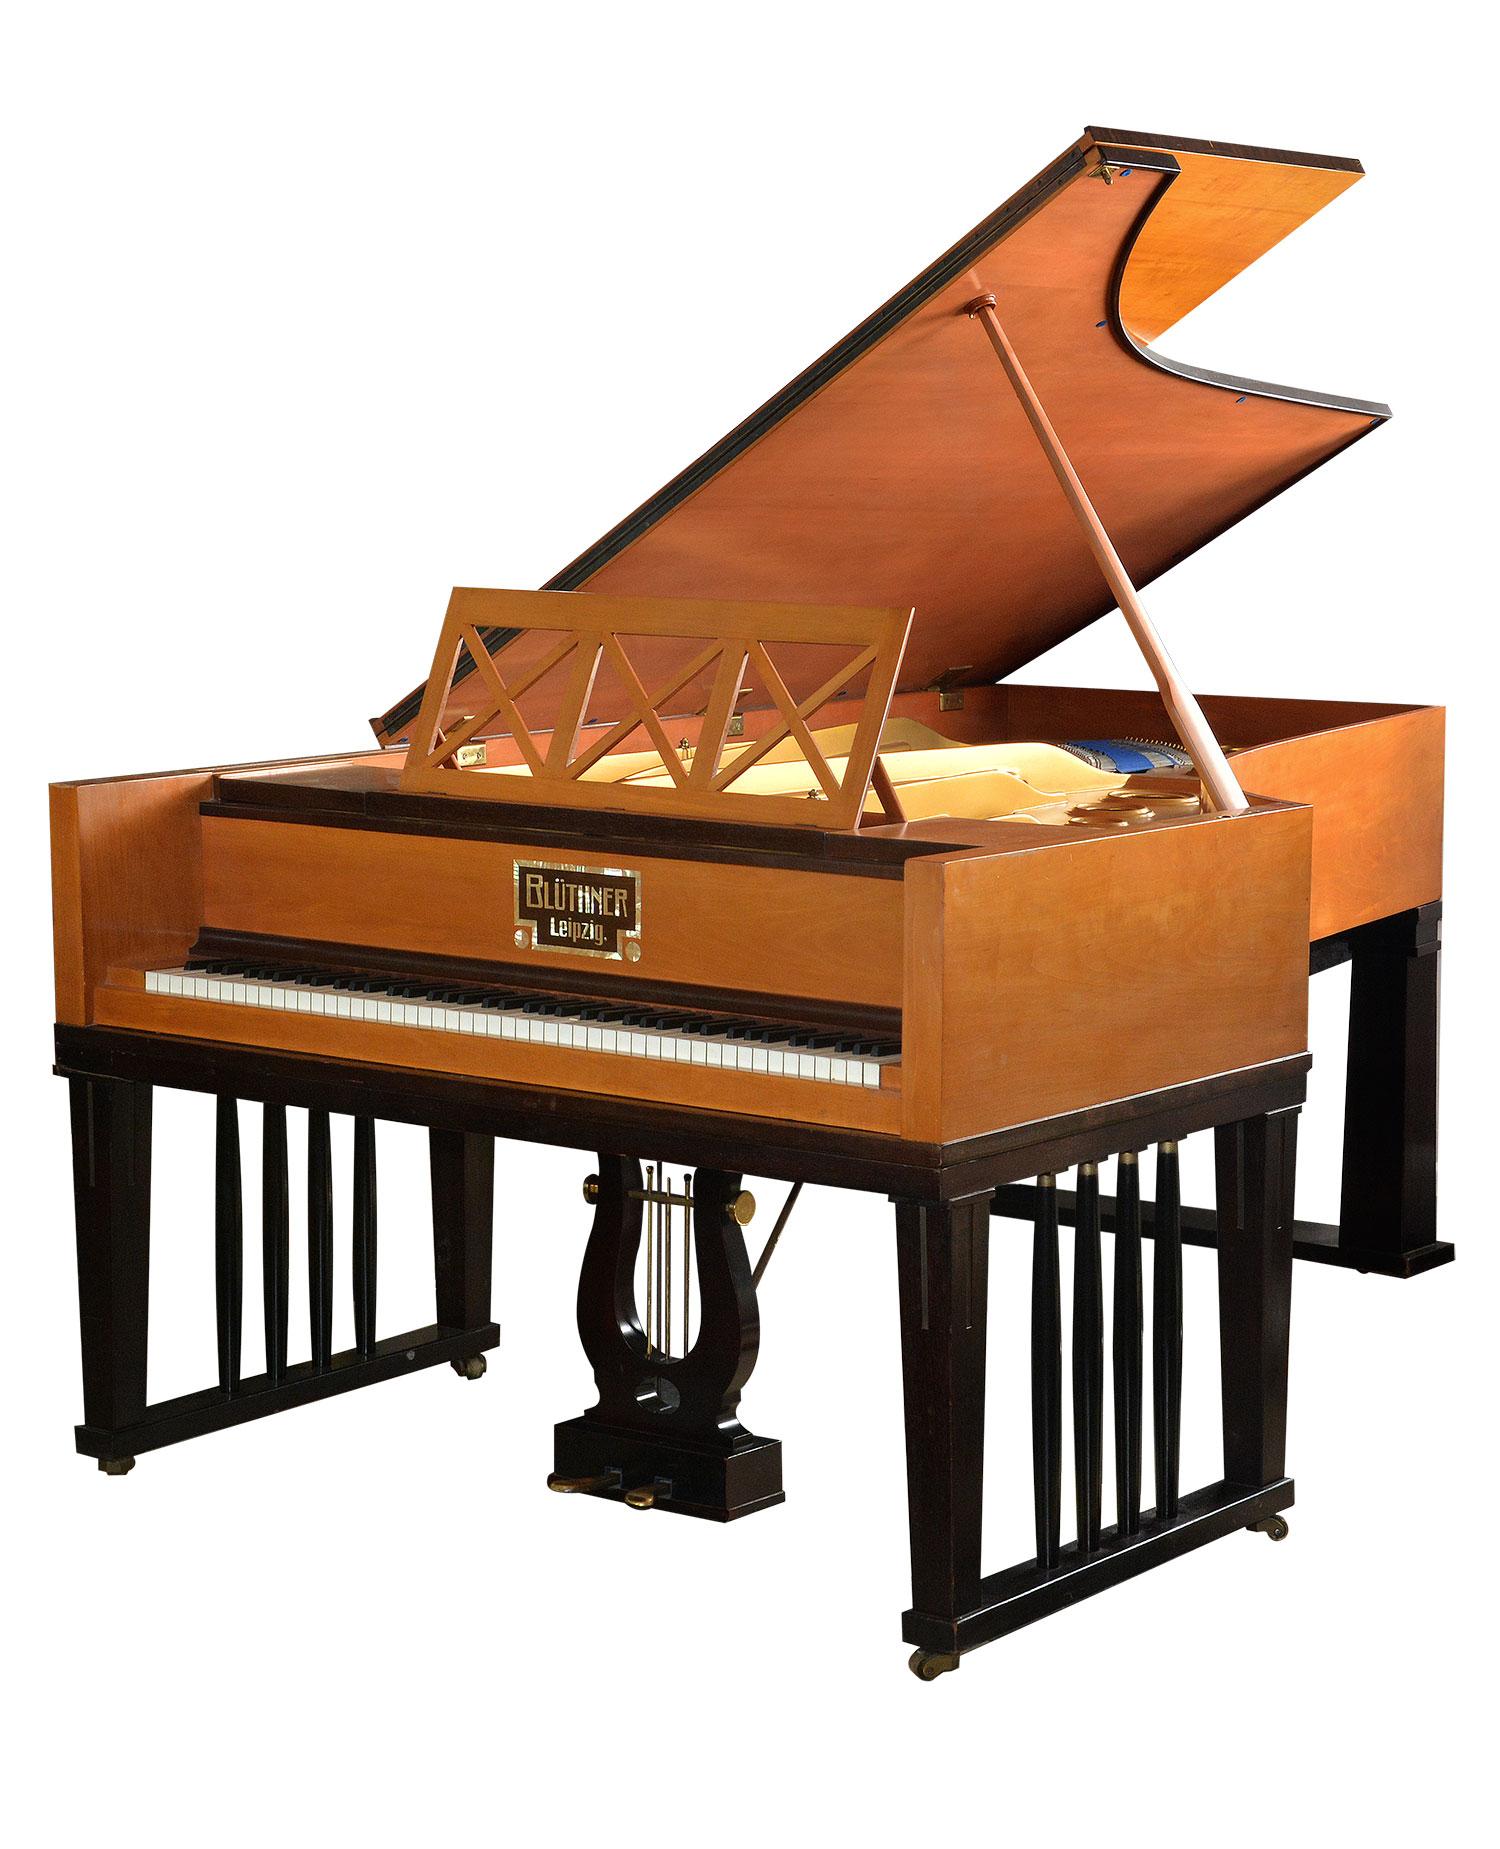 Bluthner_Art_Case_Grand_Piano